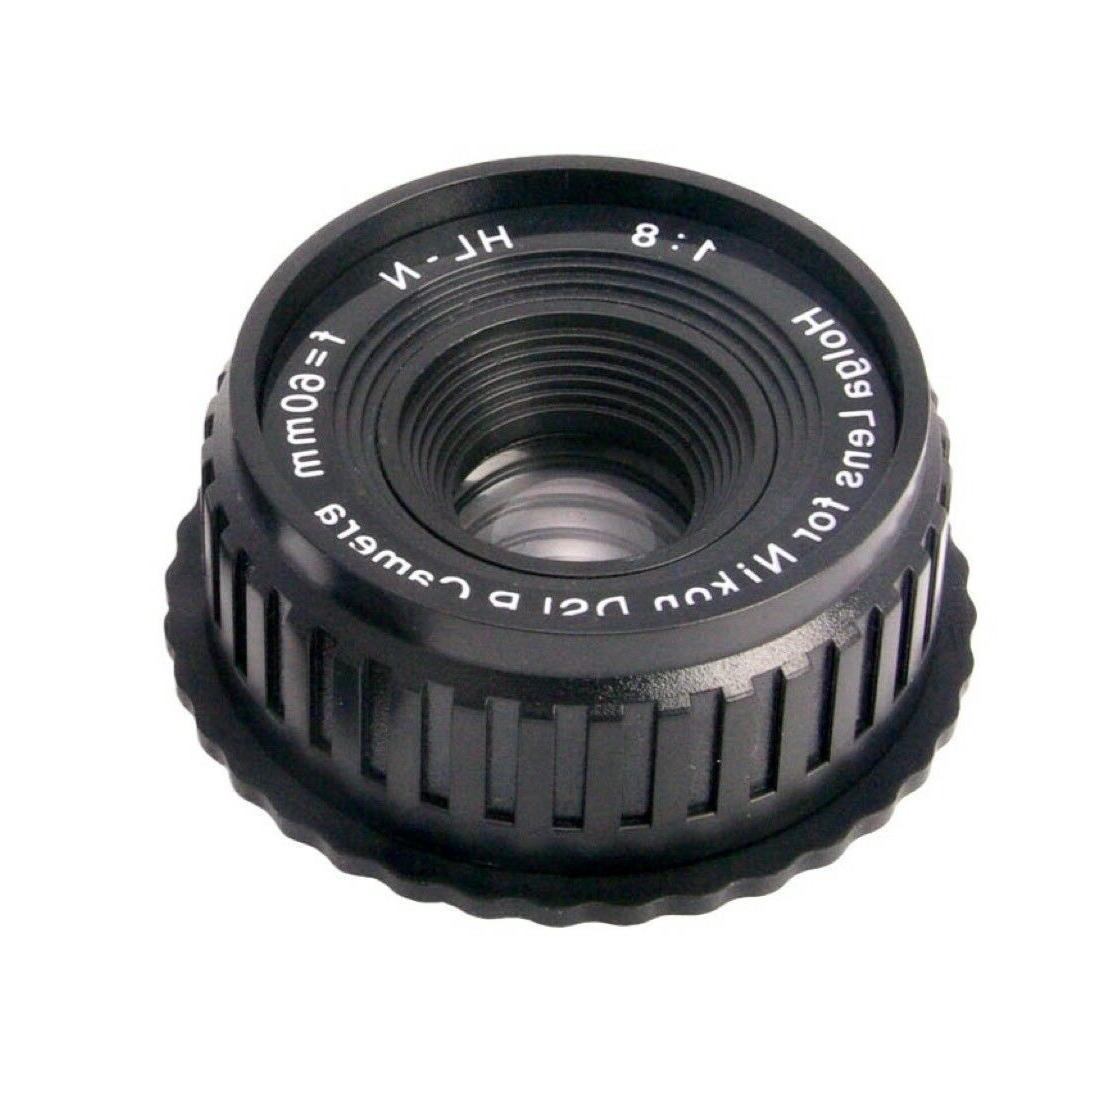 HOLGA Lens for Nikon DSLR Camera Photography Photo Lens SELLER